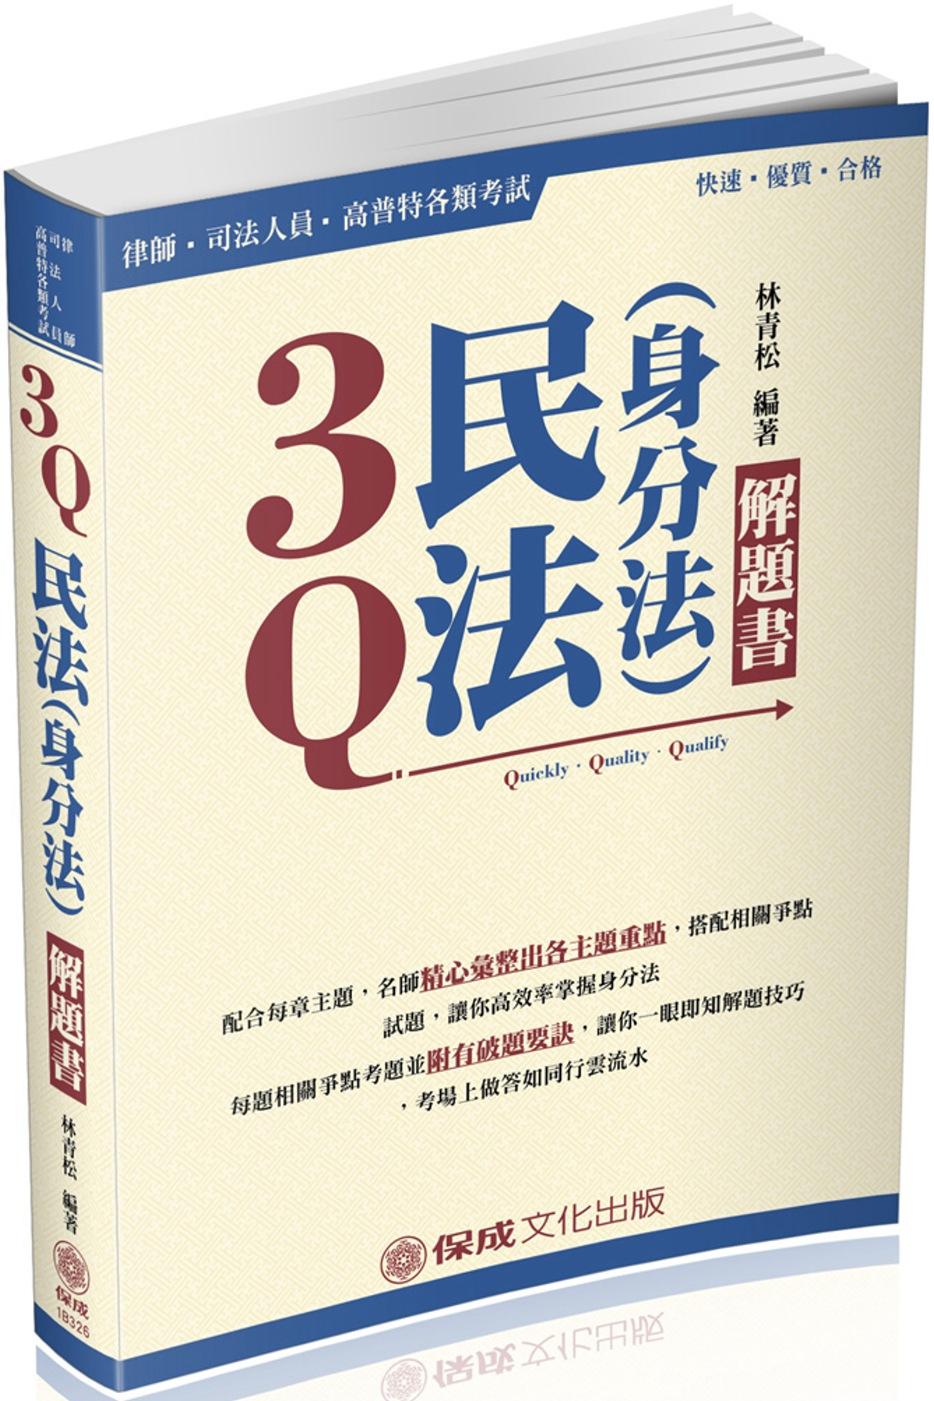 3Q民法(身分法)-解題書-2018律師.司法人員.高普特考<保成>(十一版)